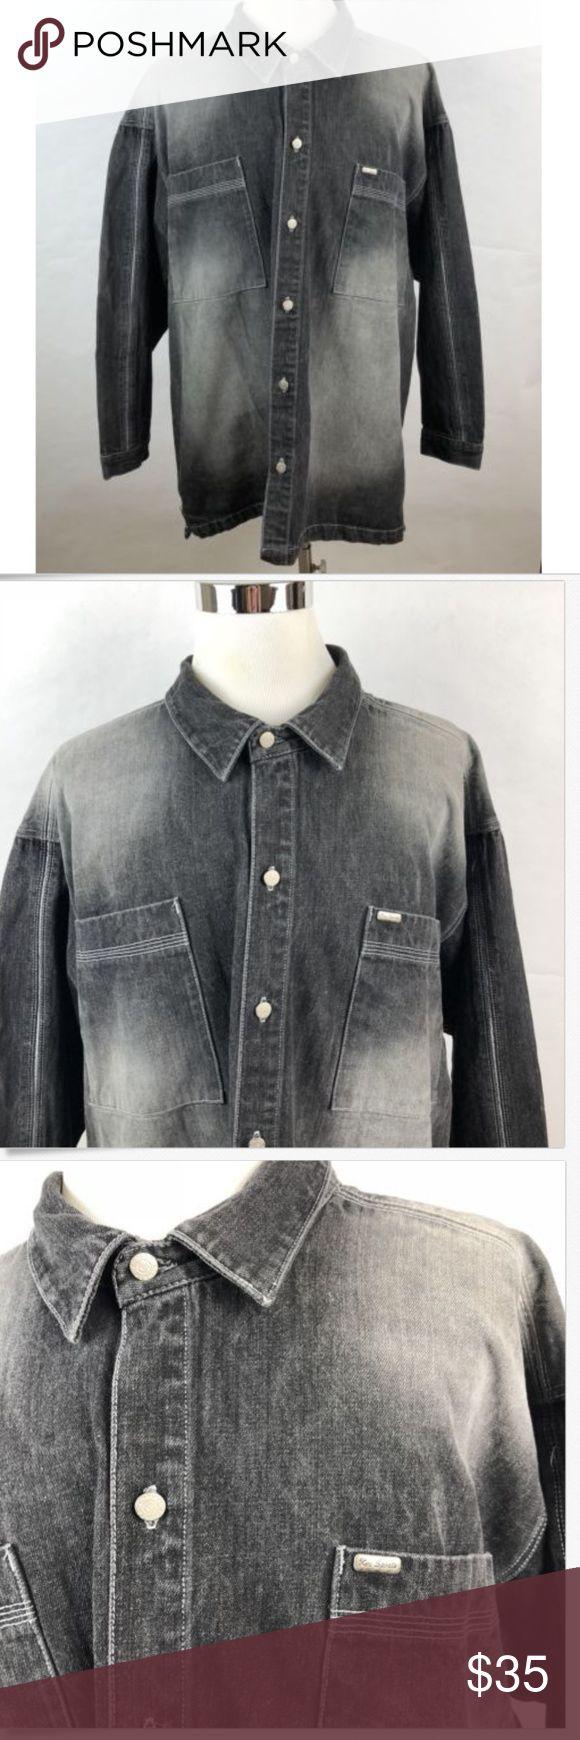 Koman Jeans Denim Jacket Koman Jeans Mens Denim Jacket Size Xxxl Distressed Wash Gray 100 Cotton All Measurements Are Tak Clothes Design Denim Jacket Fashion [ 1740 x 580 Pixel ]